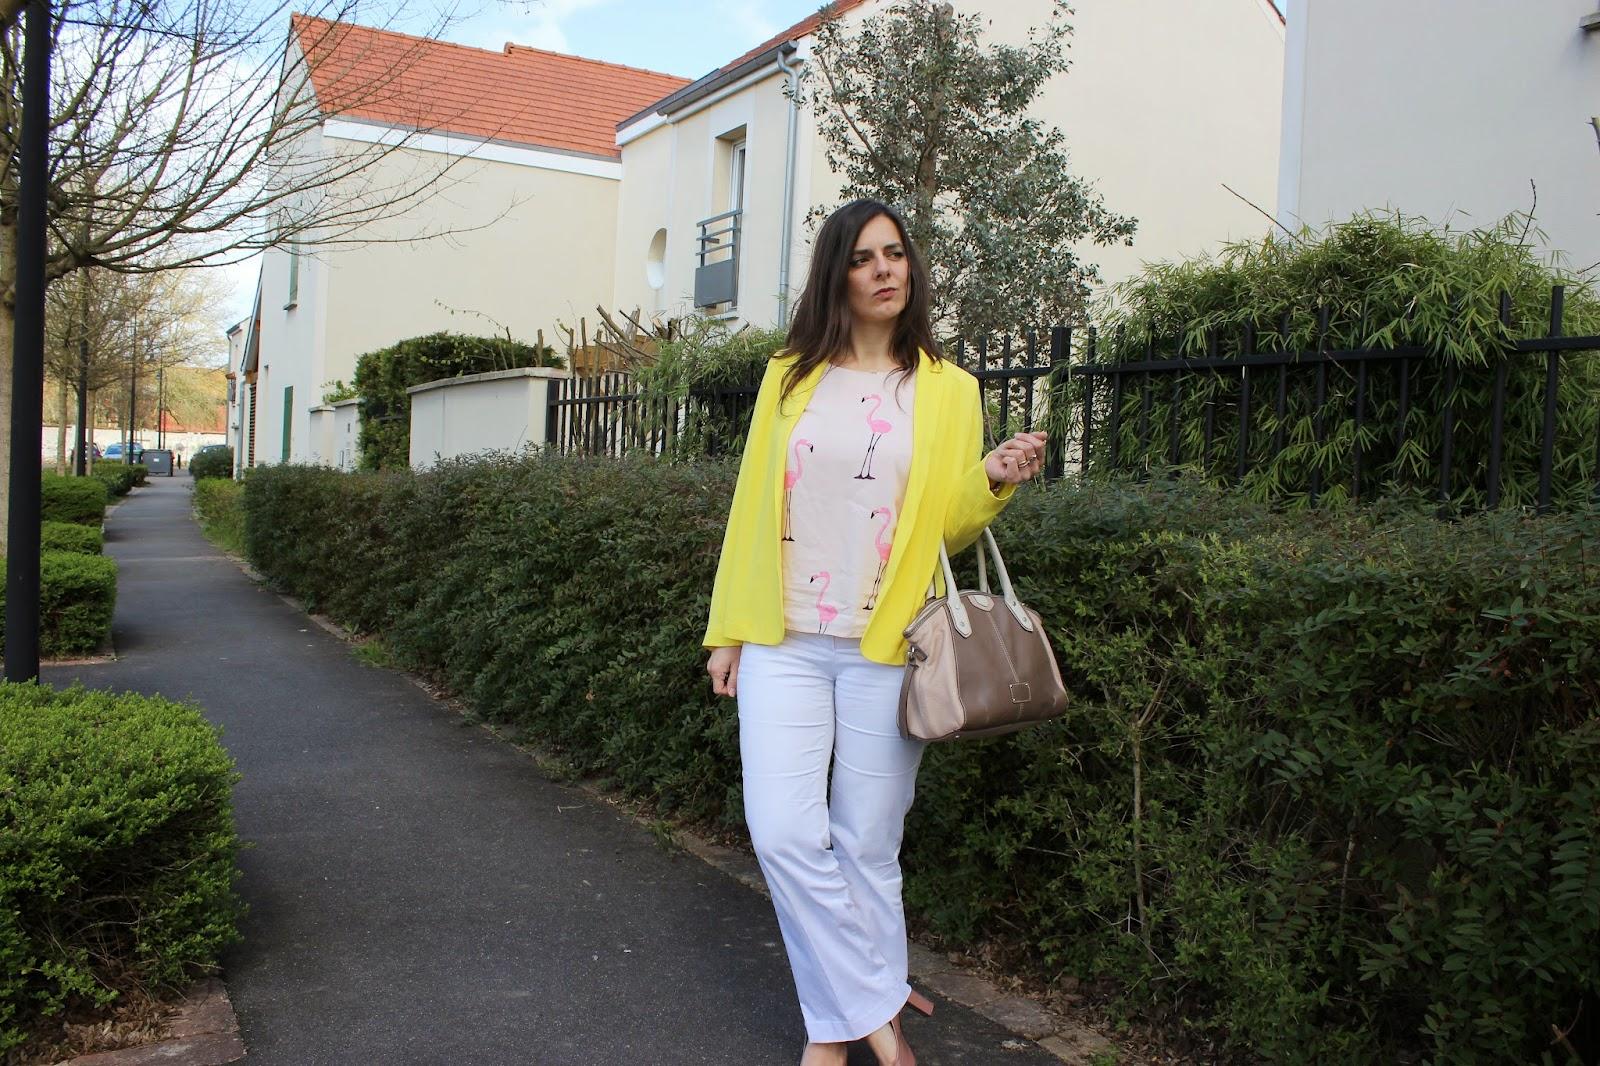 veste jaune balsamik, top flamant rose H et M, sac clarks défimorphoweek